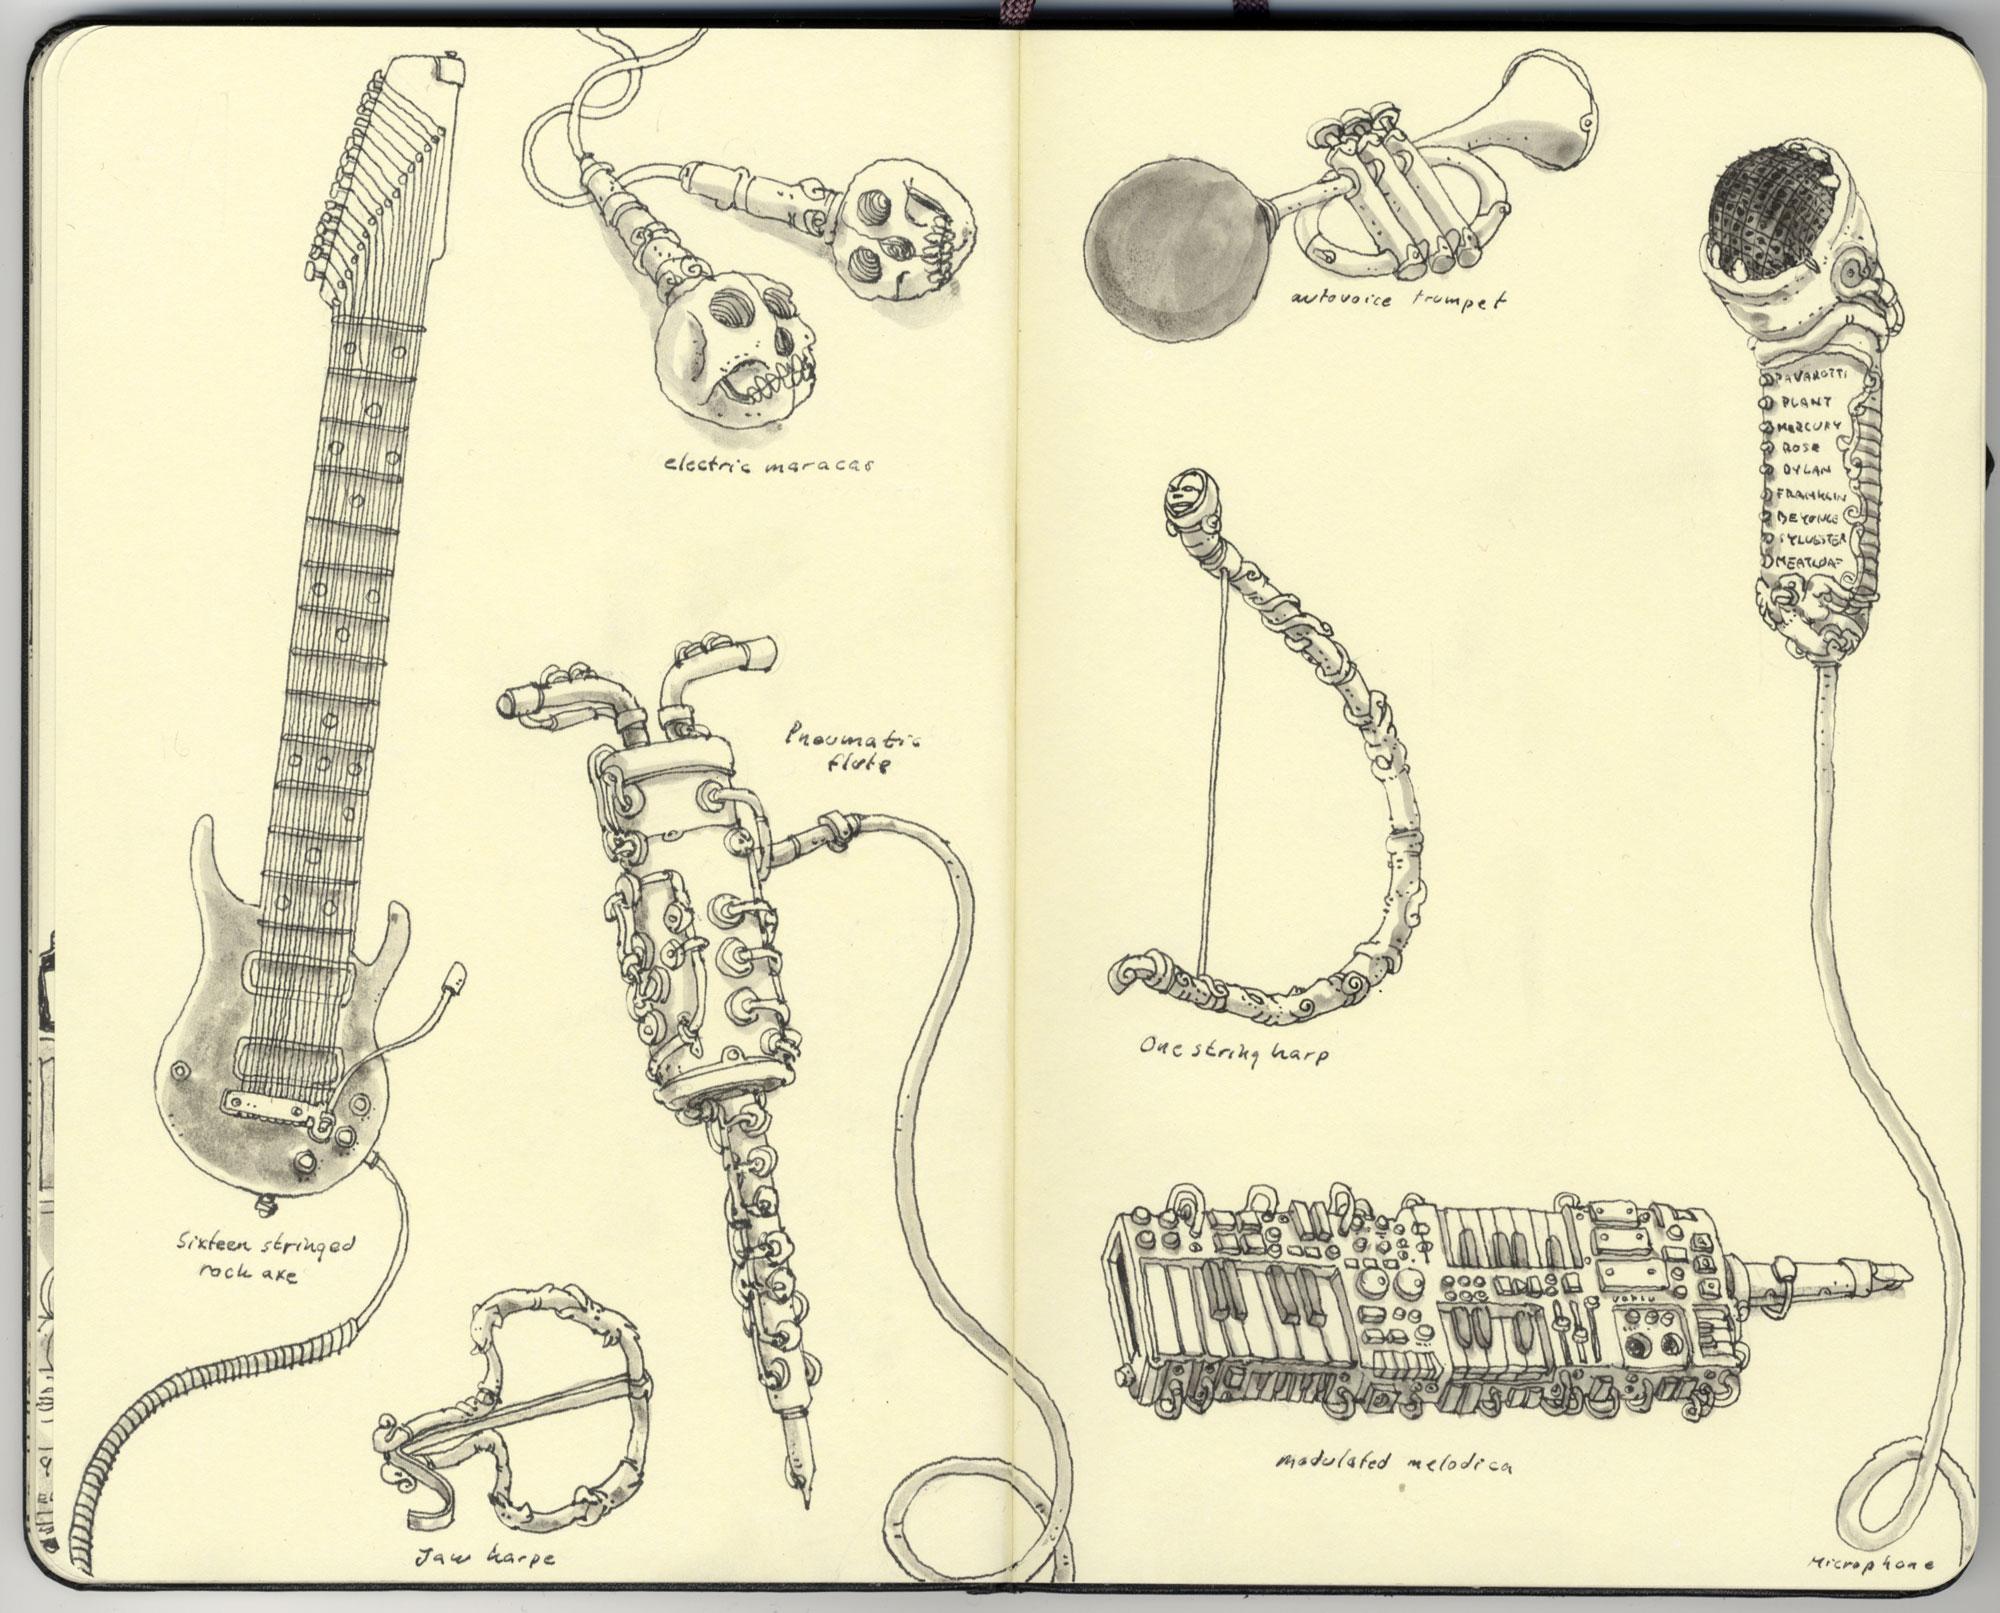 Music to my ears by MattiasA